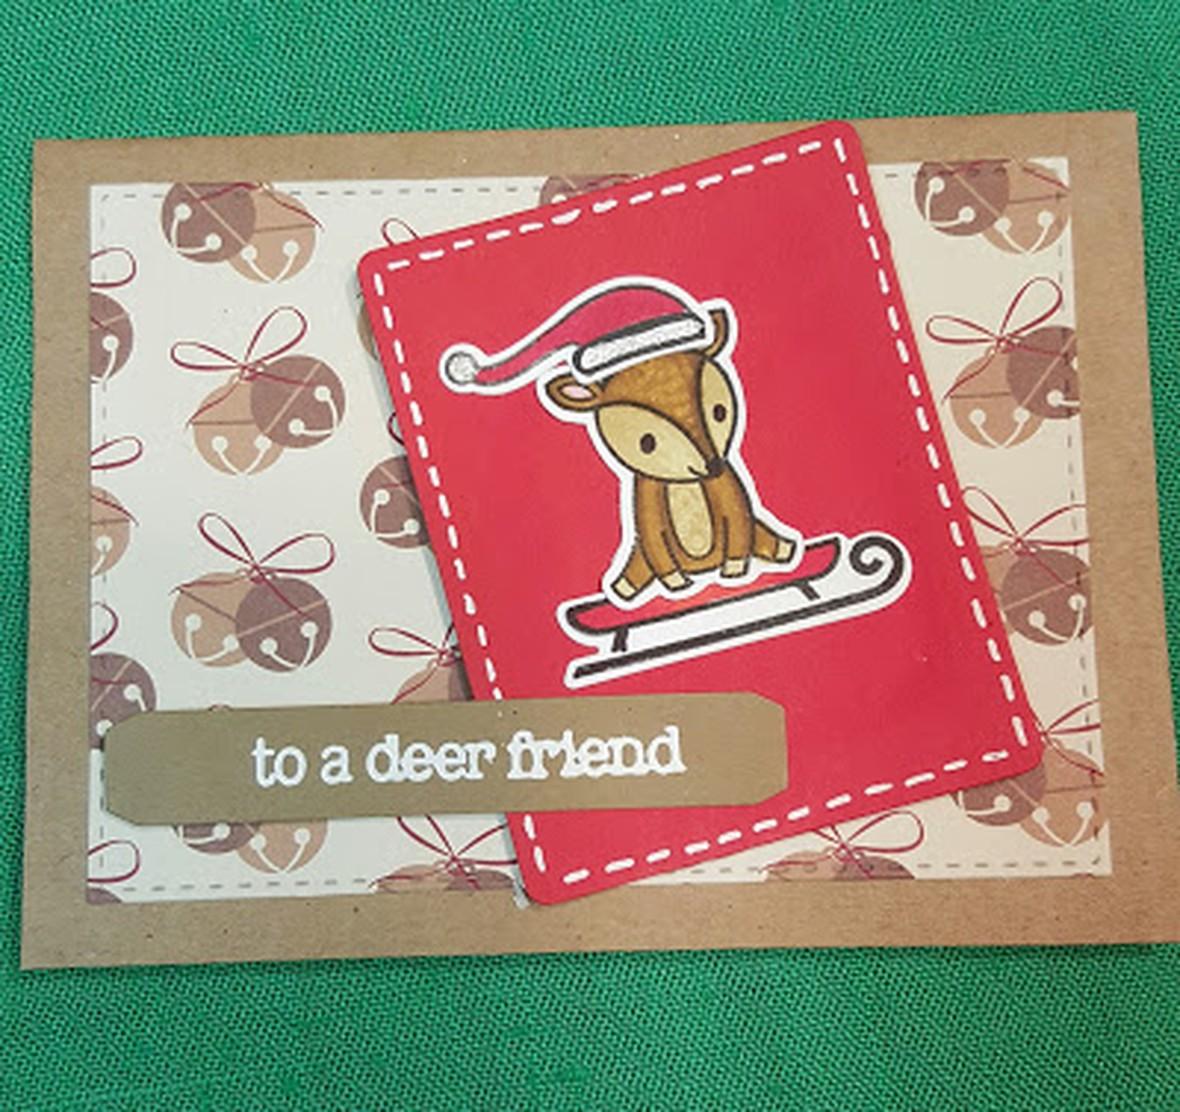 To dear friend card original